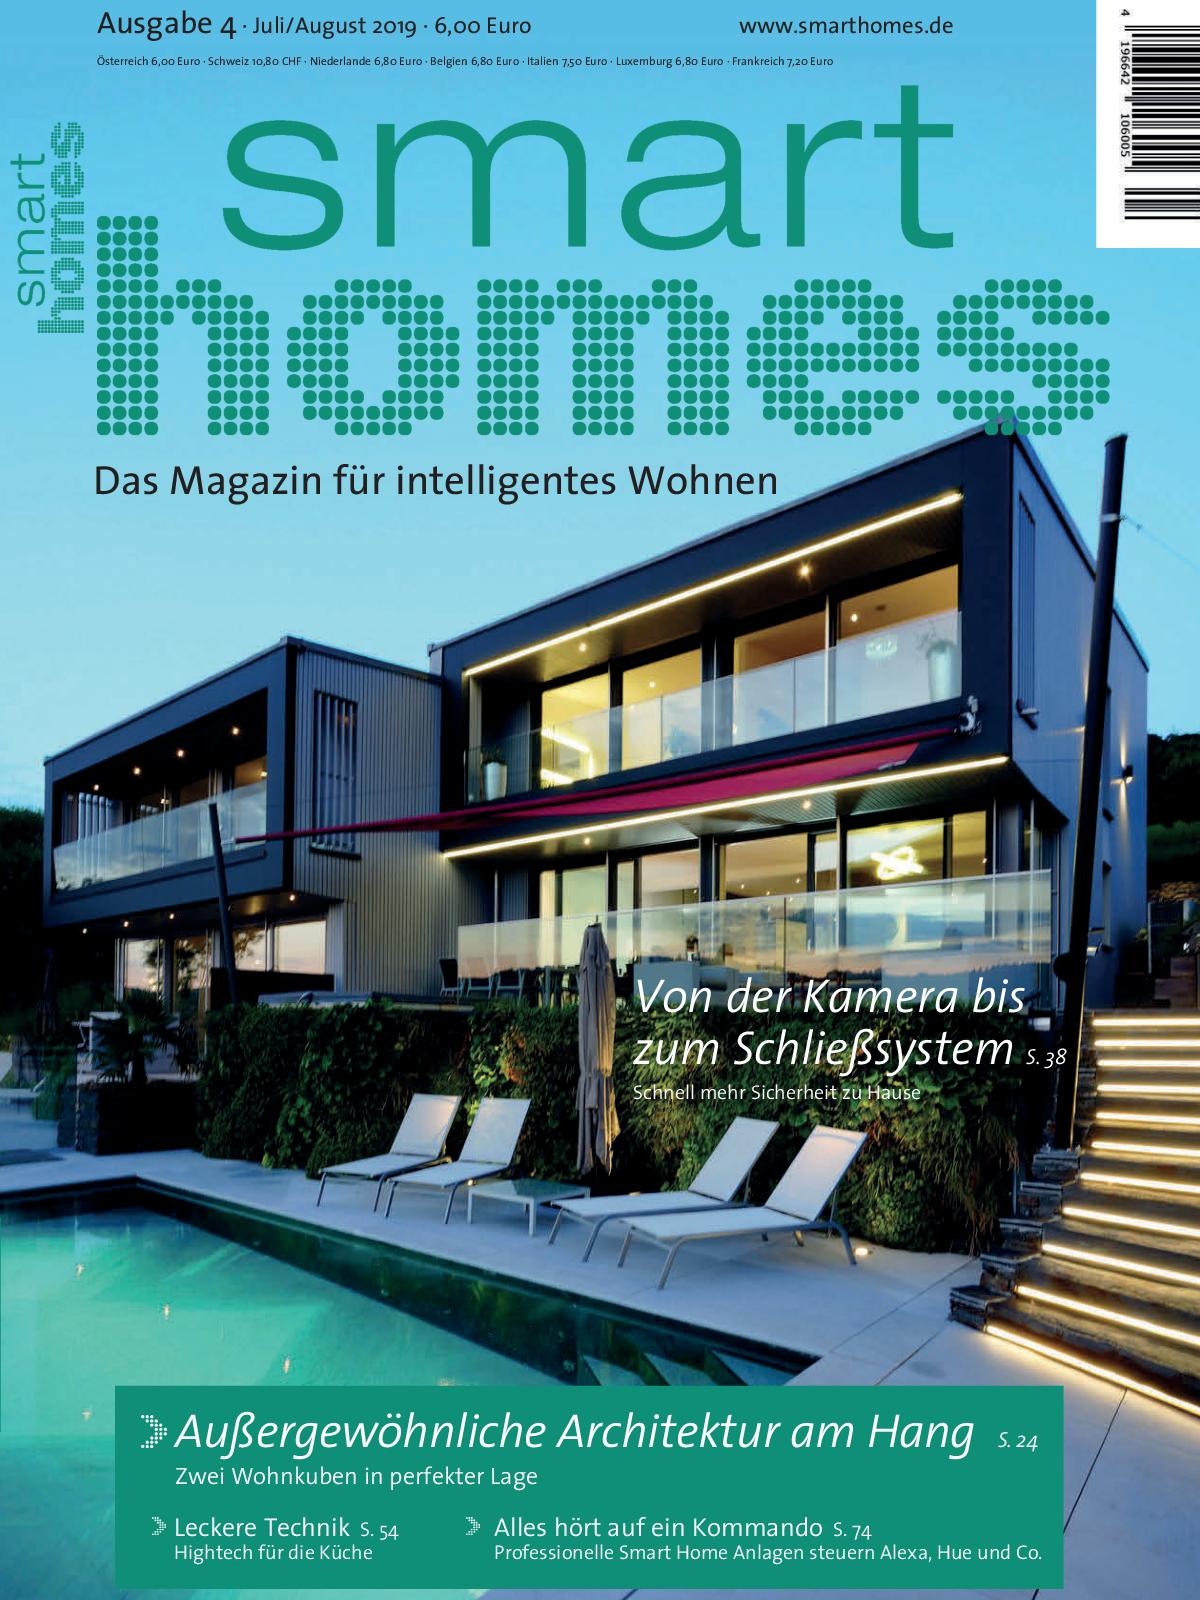 smart homes Ausgabe 4 2019